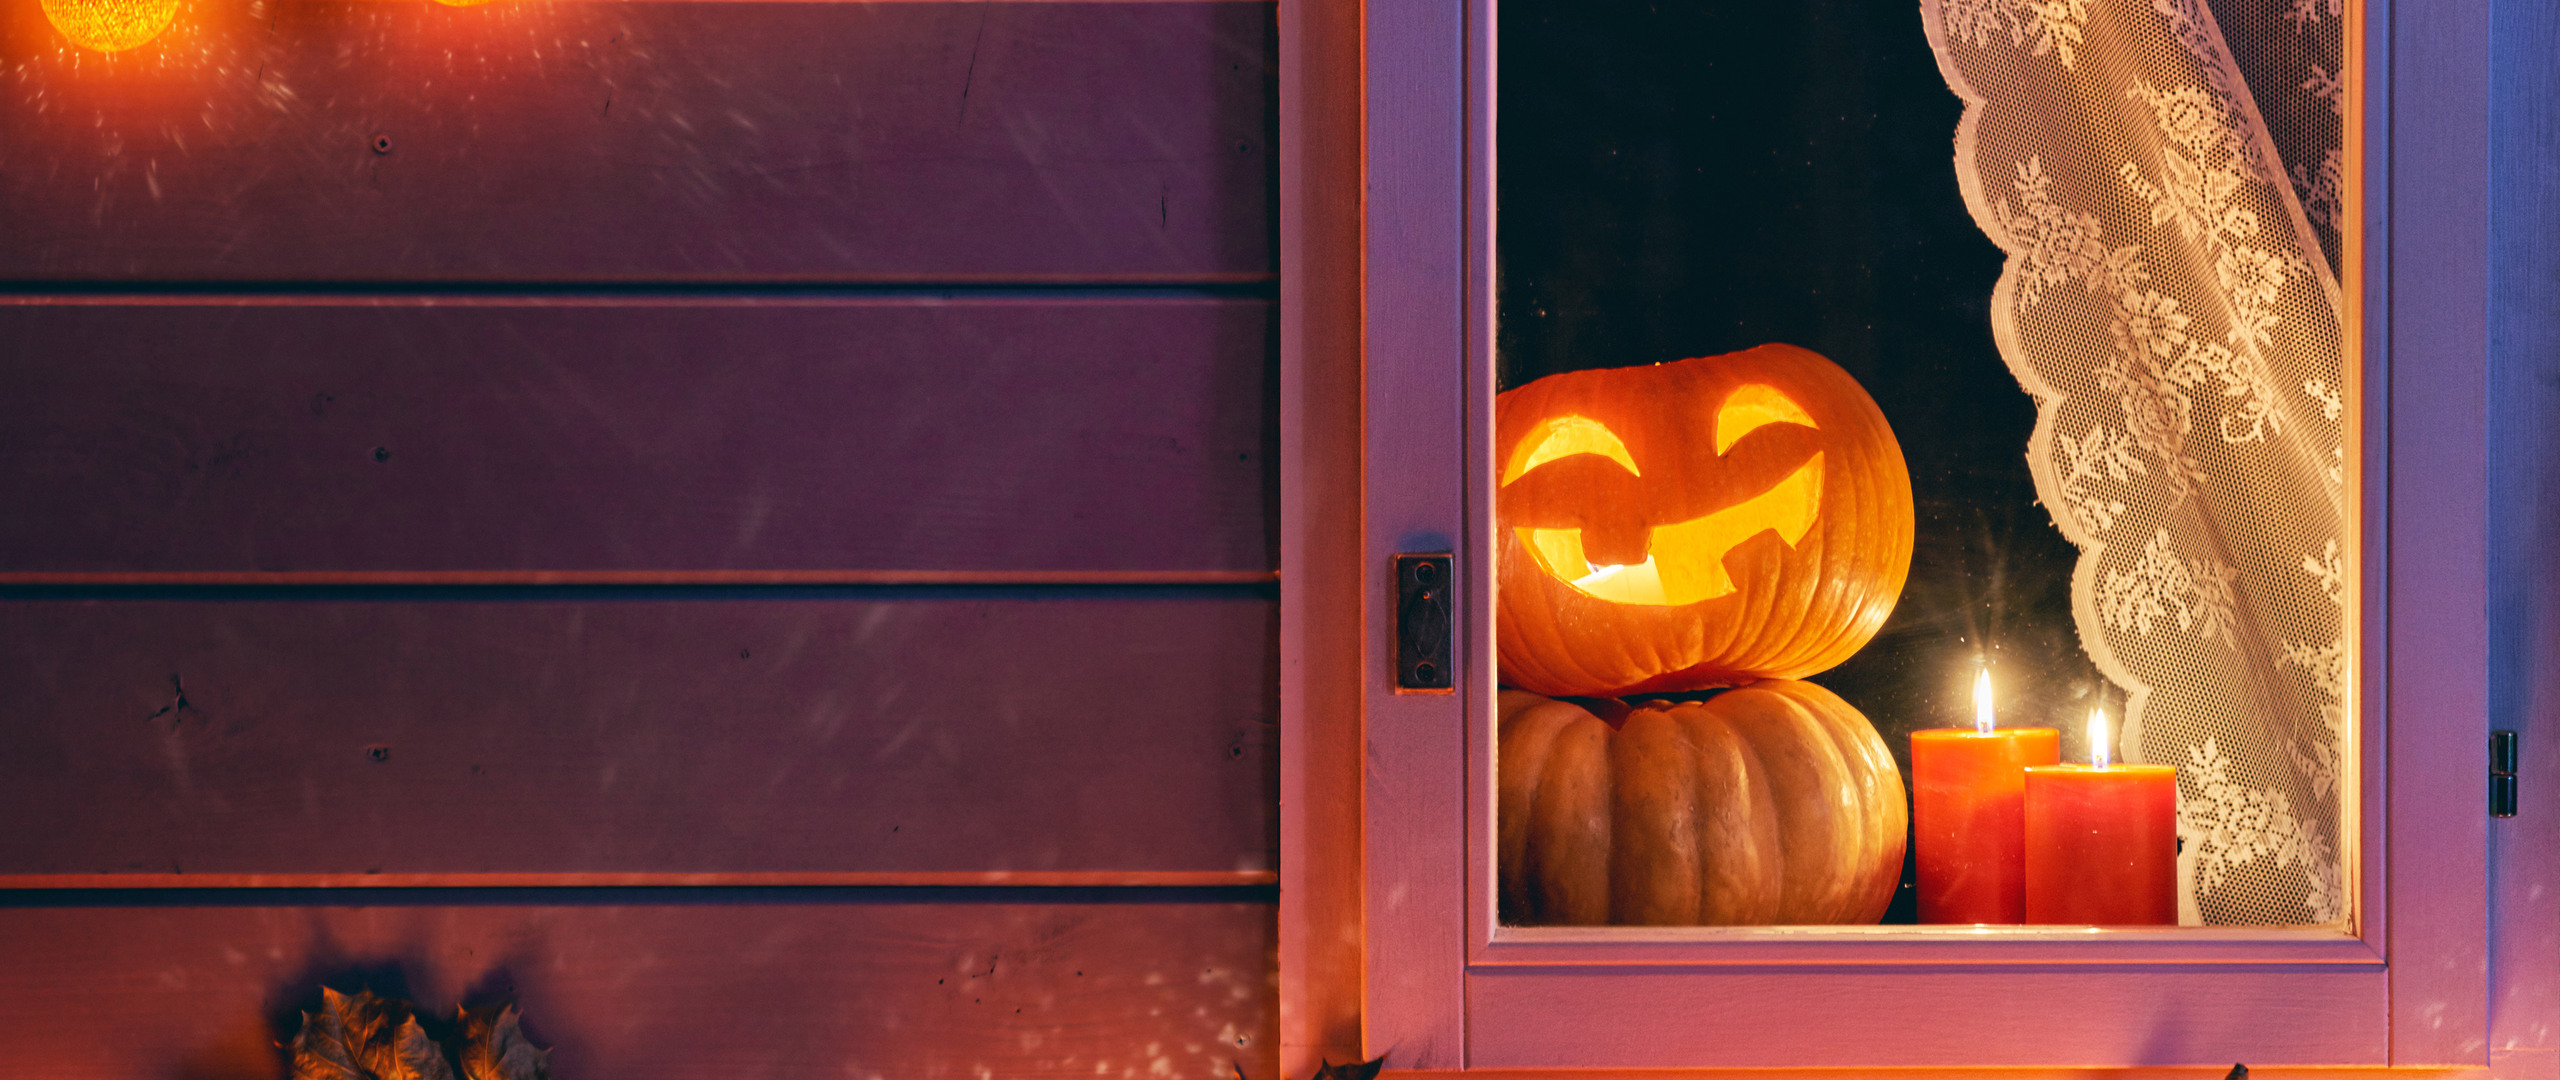 happy-halloween-hd-hd.jpg